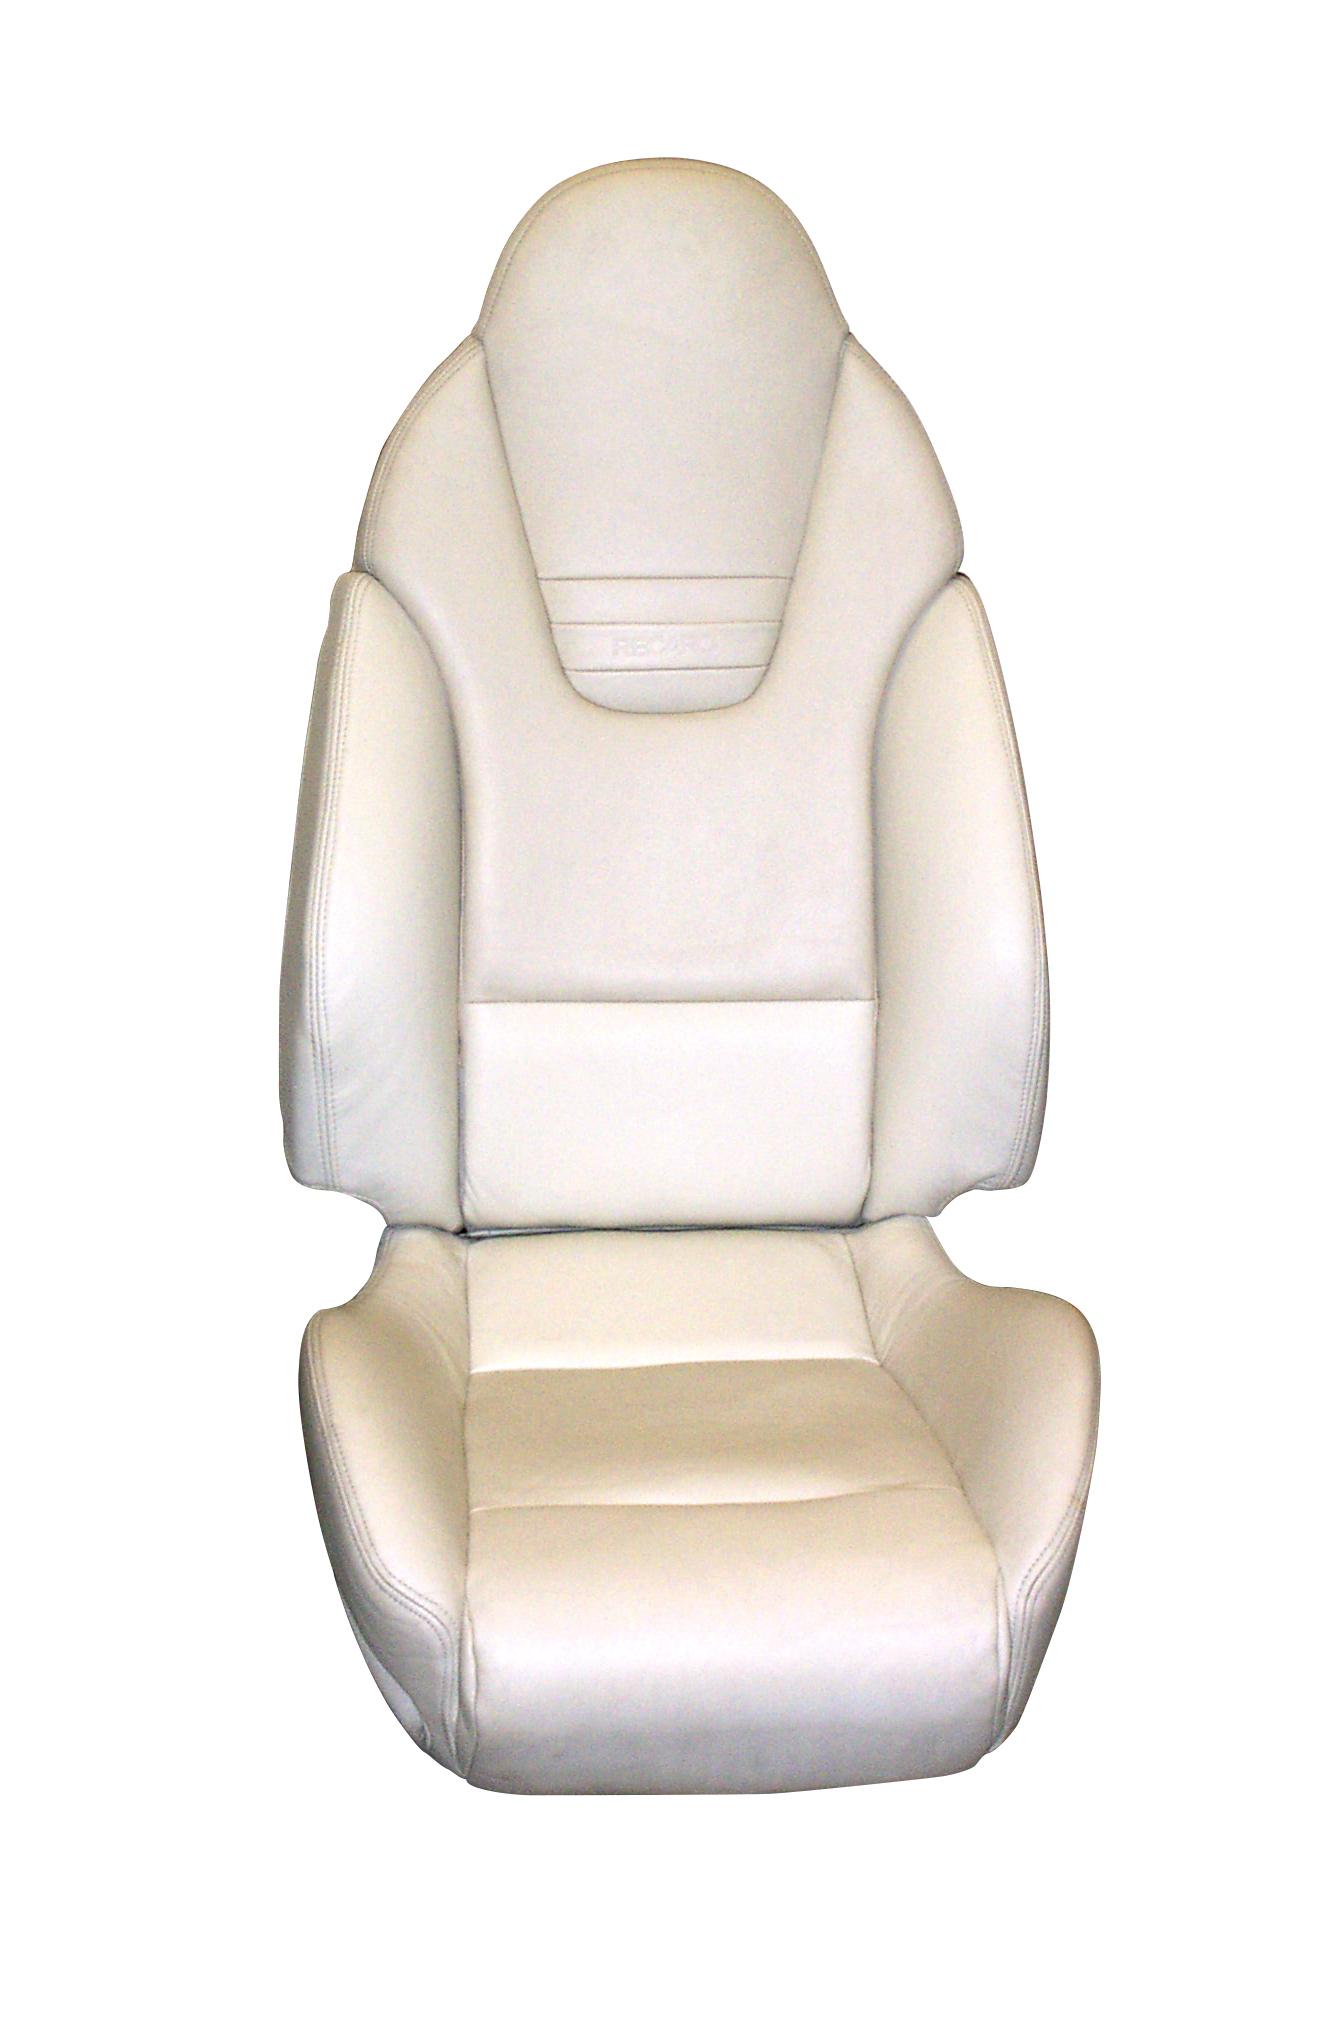 Custom+racing+seat